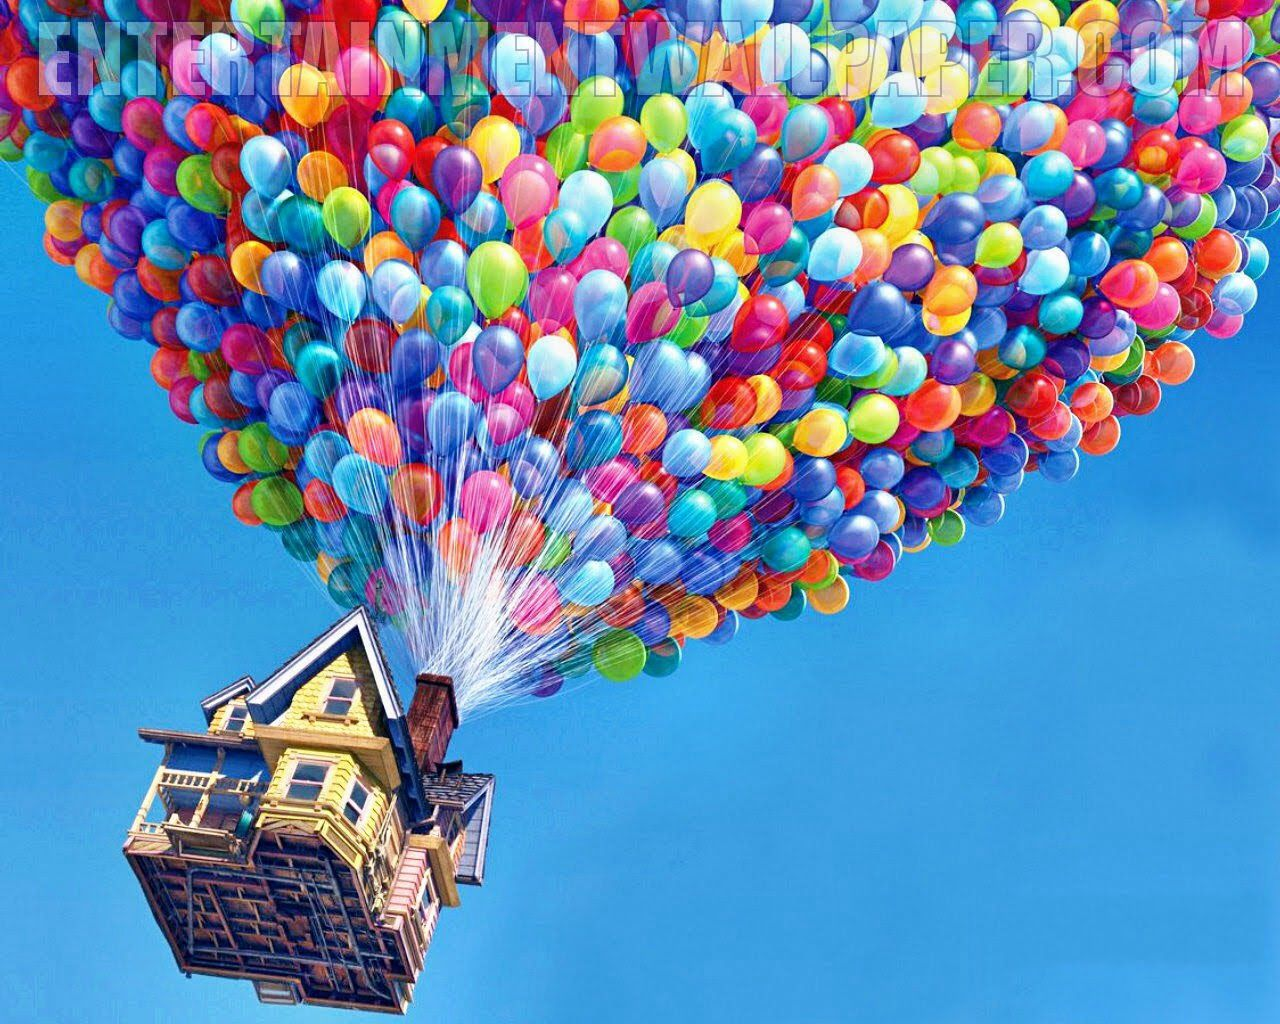 Must see Wallpaper Night Hot Air Balloon - b7a4cbdbbf8dc1214d6bfad04dfdbf84  Trends-387078.jpg